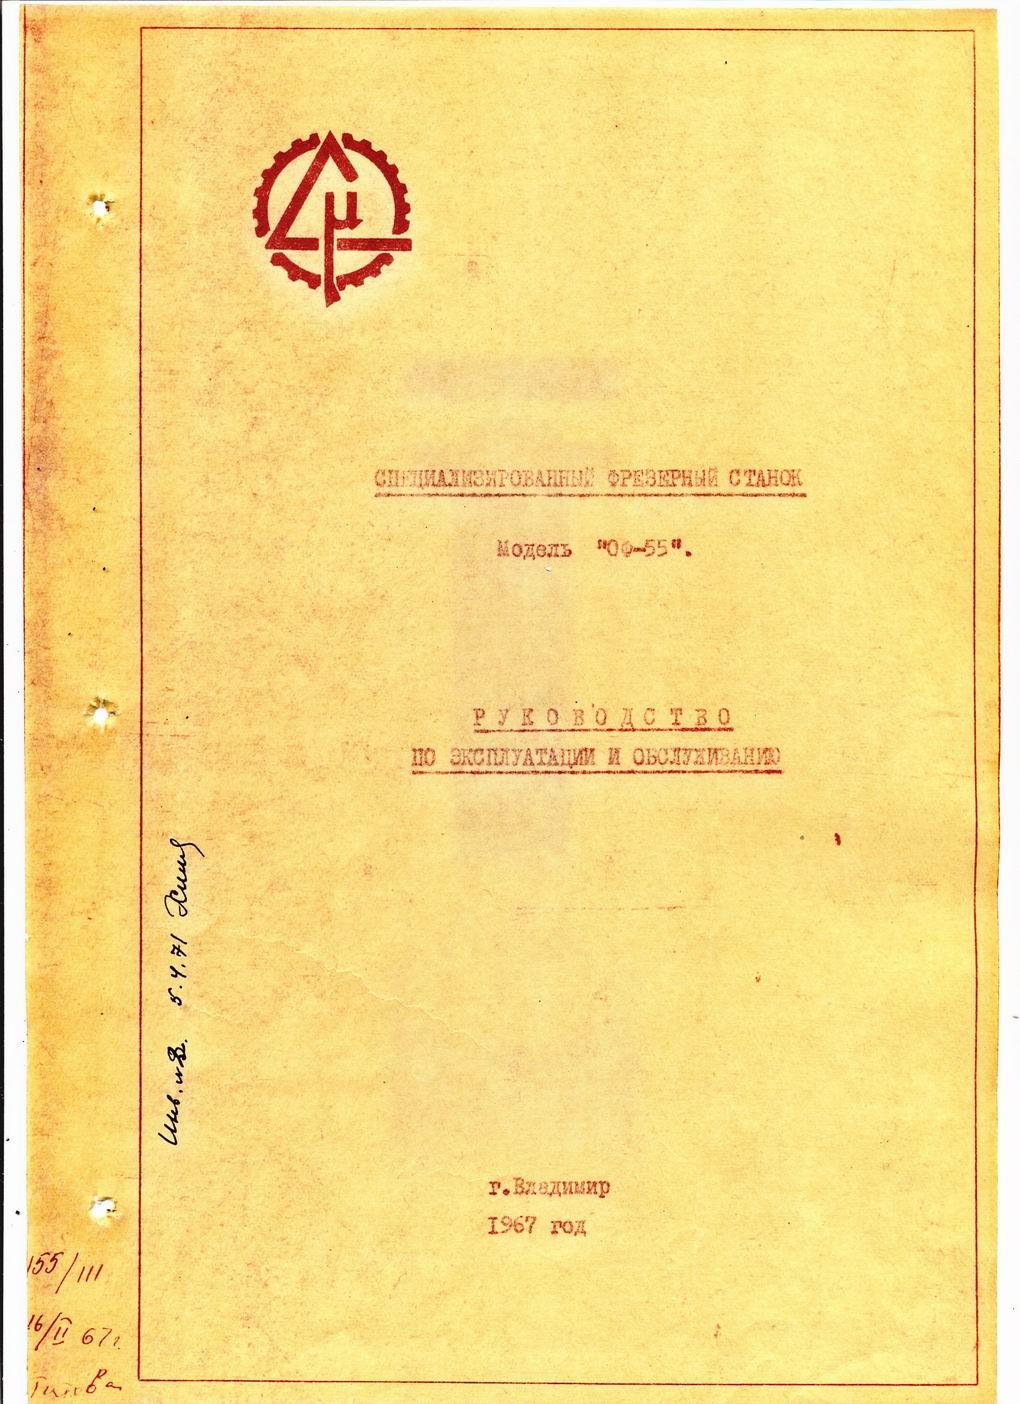 Фрезерный станок оф-55: технические характеристики, паспорт